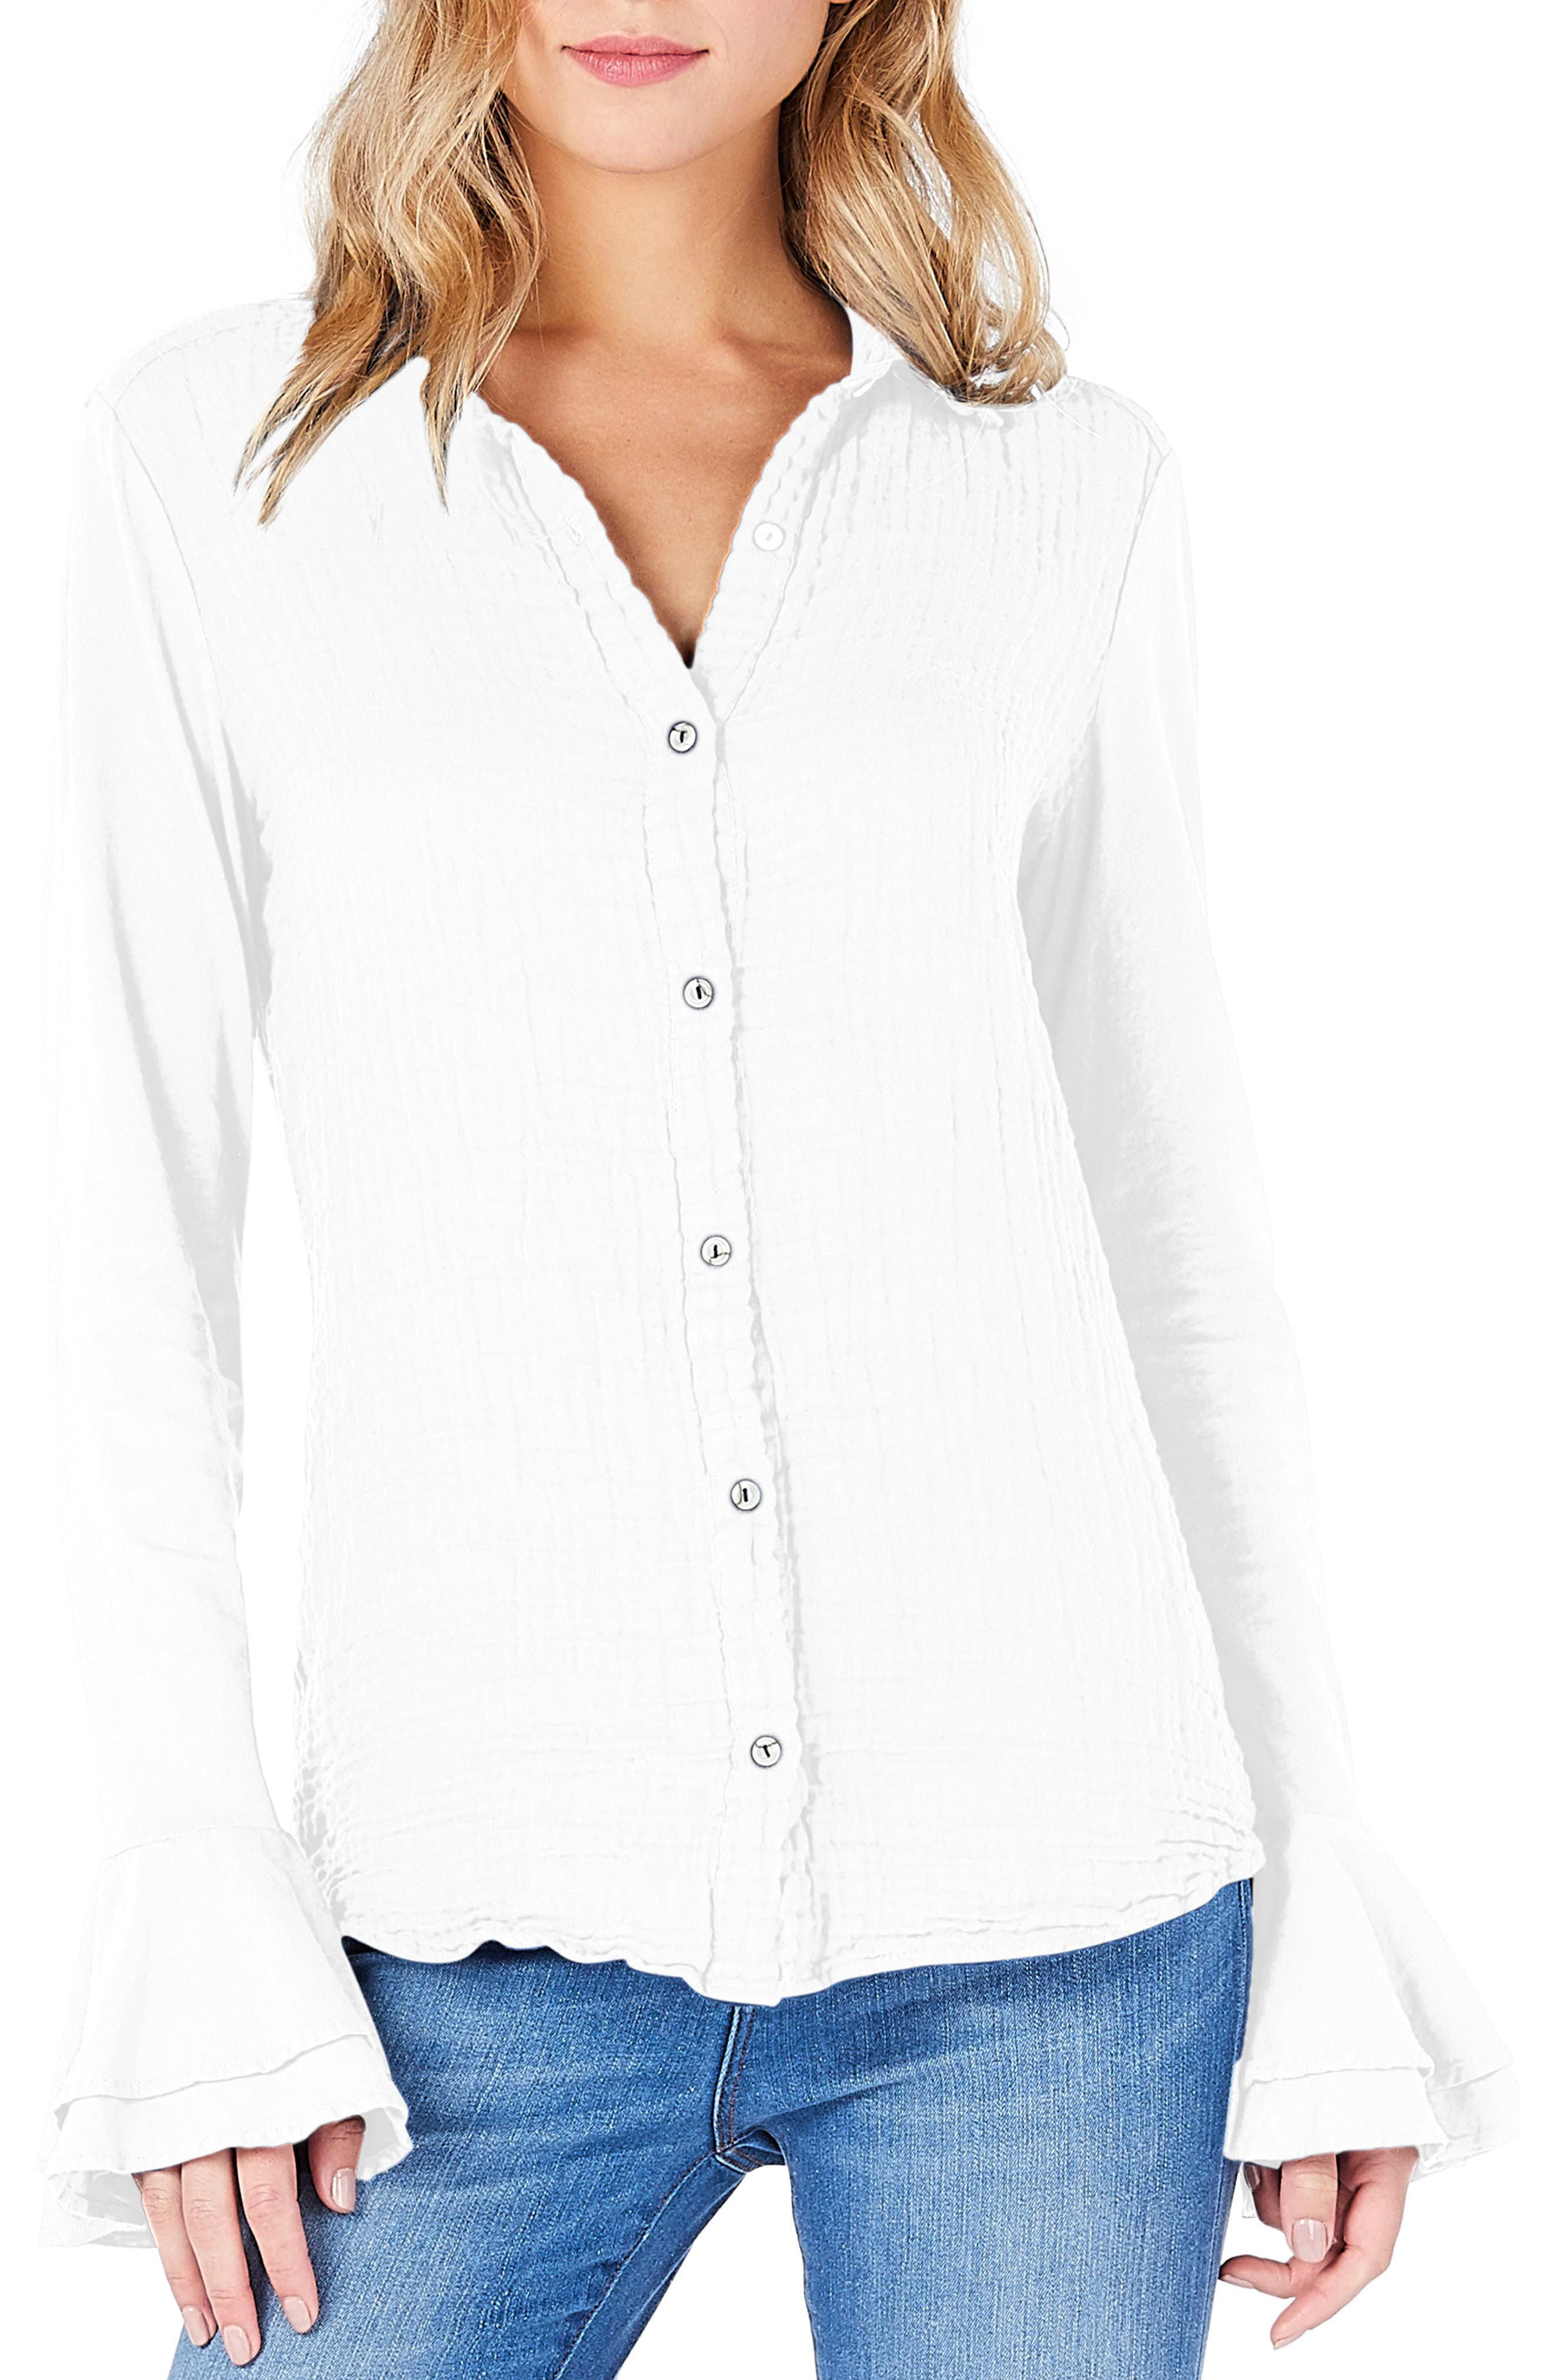 Ruffle Sleeve Shirt,                         Main,                         color, White